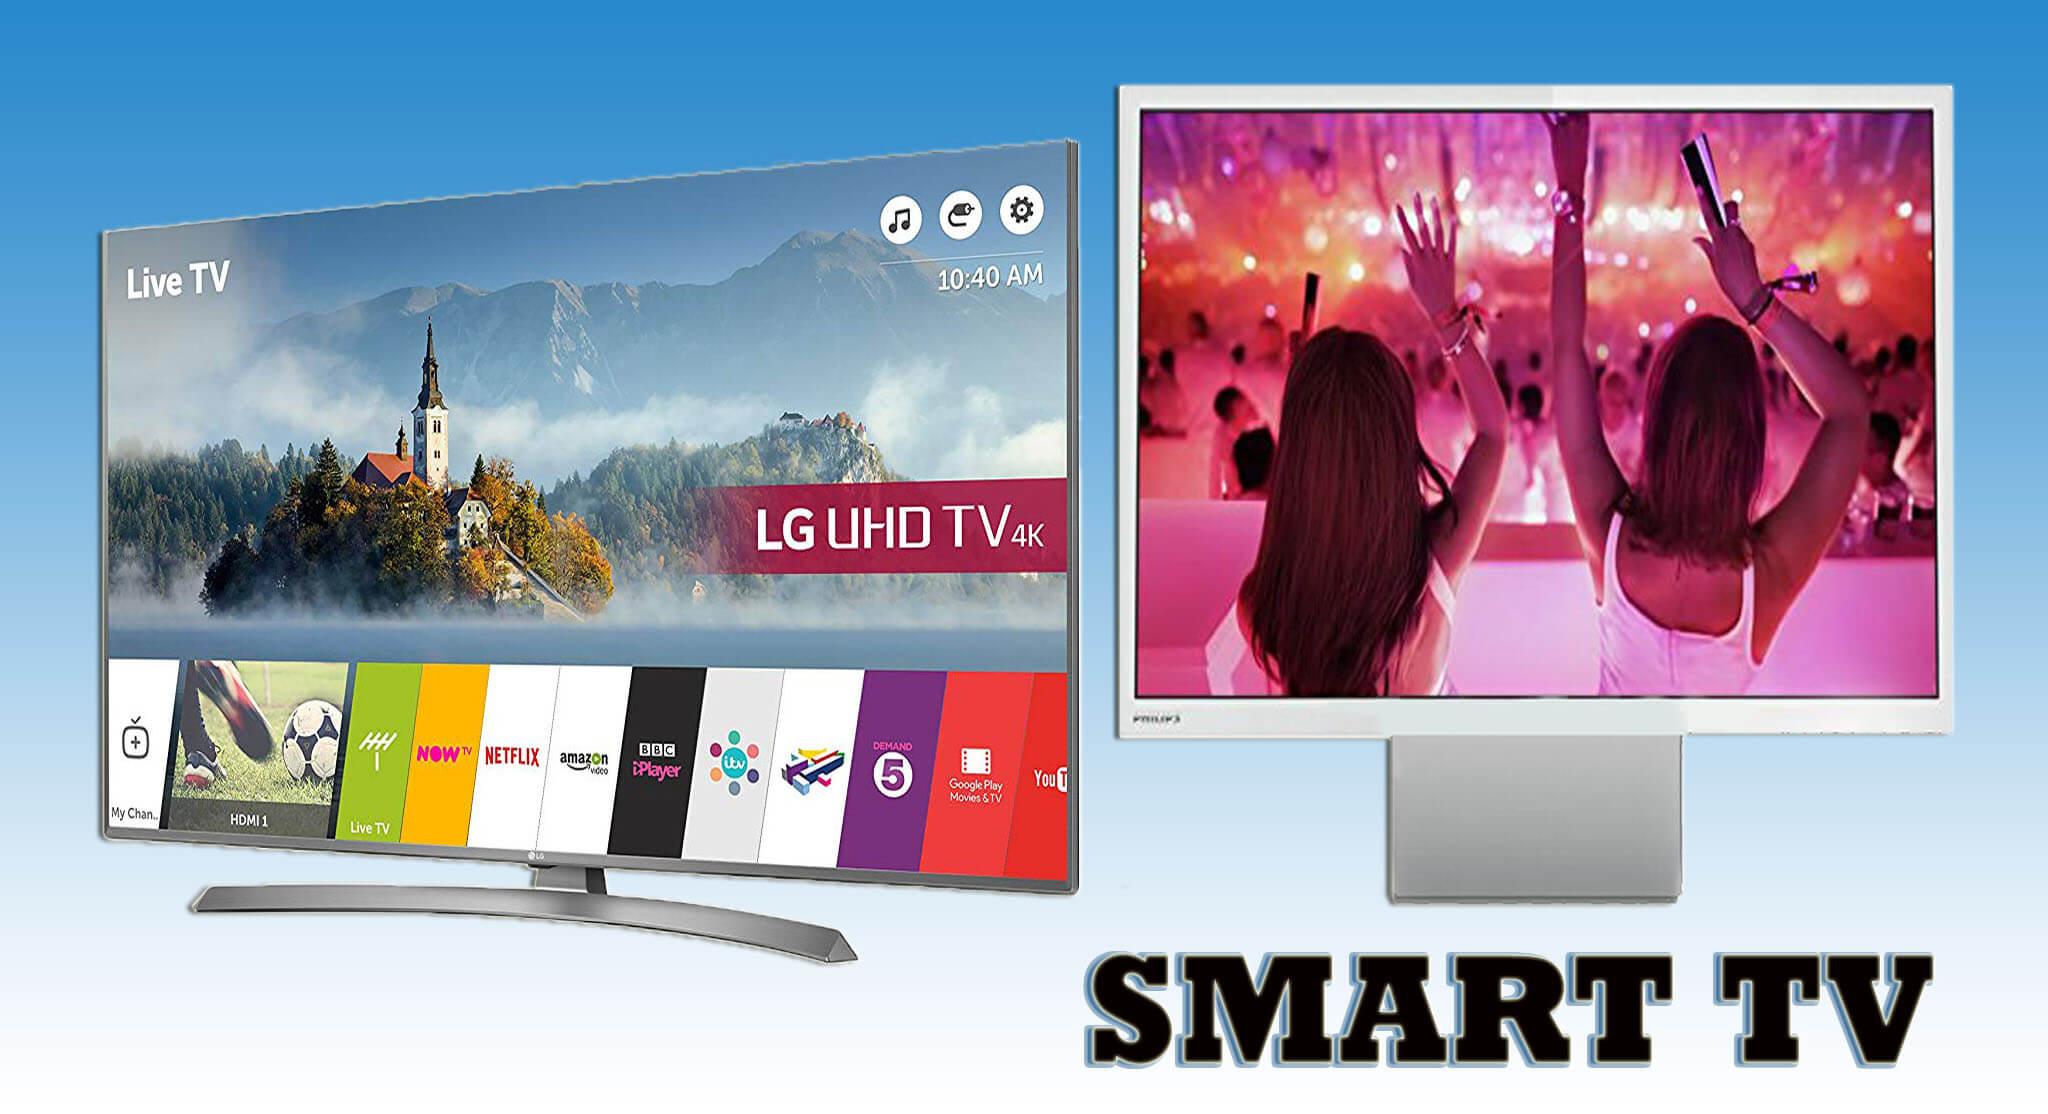 Smart TV Slider